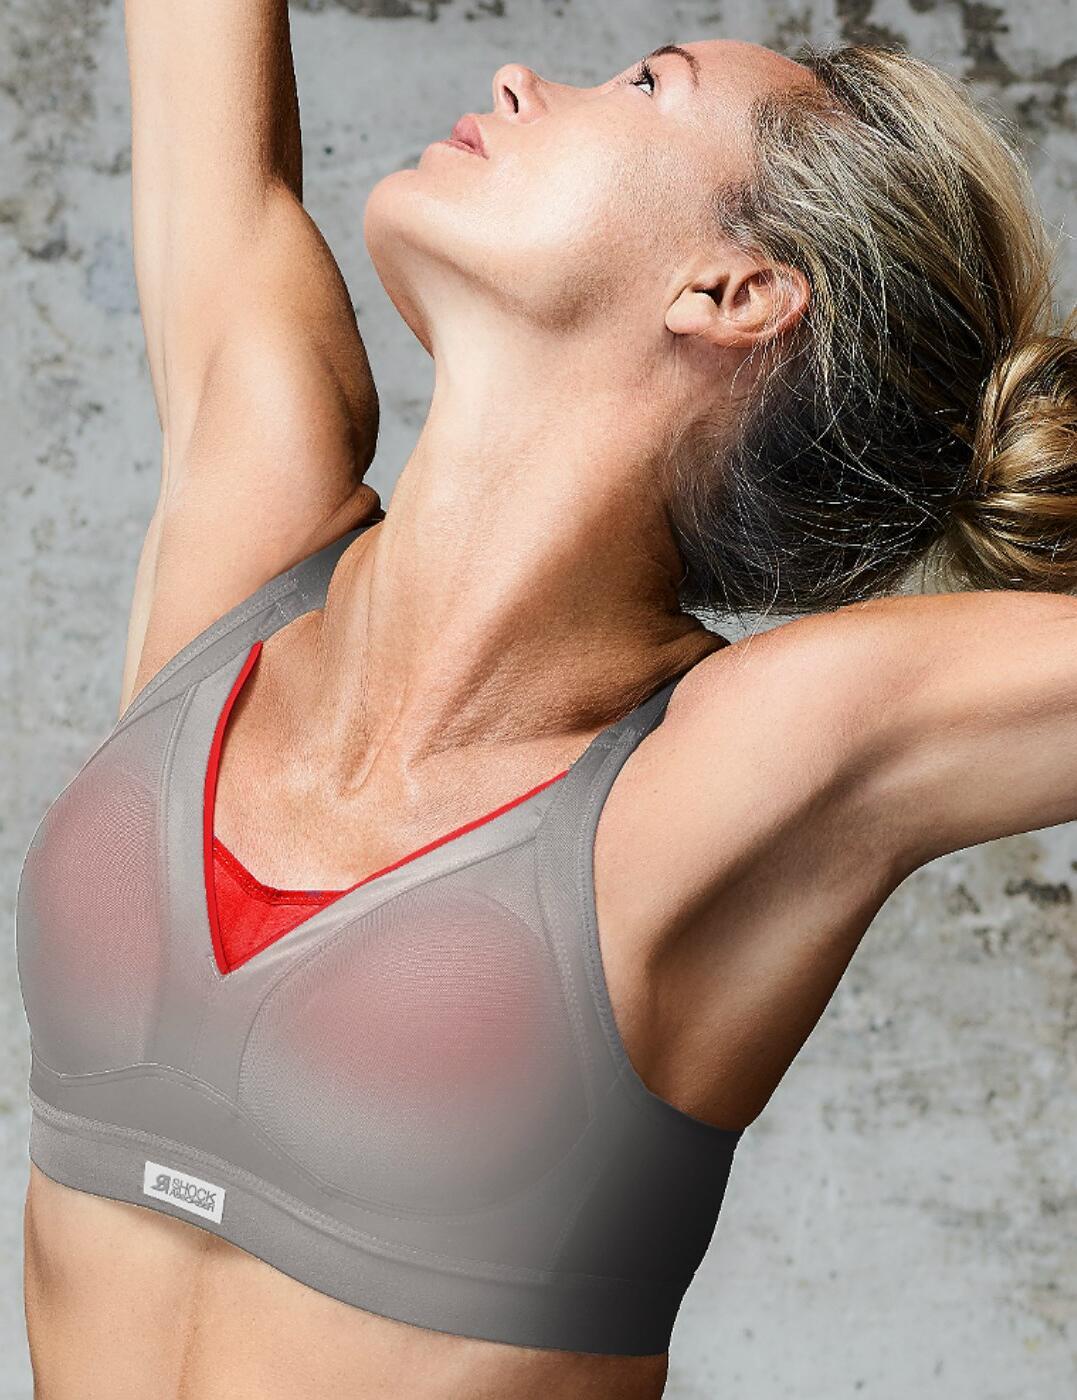 Mature women in sports bras